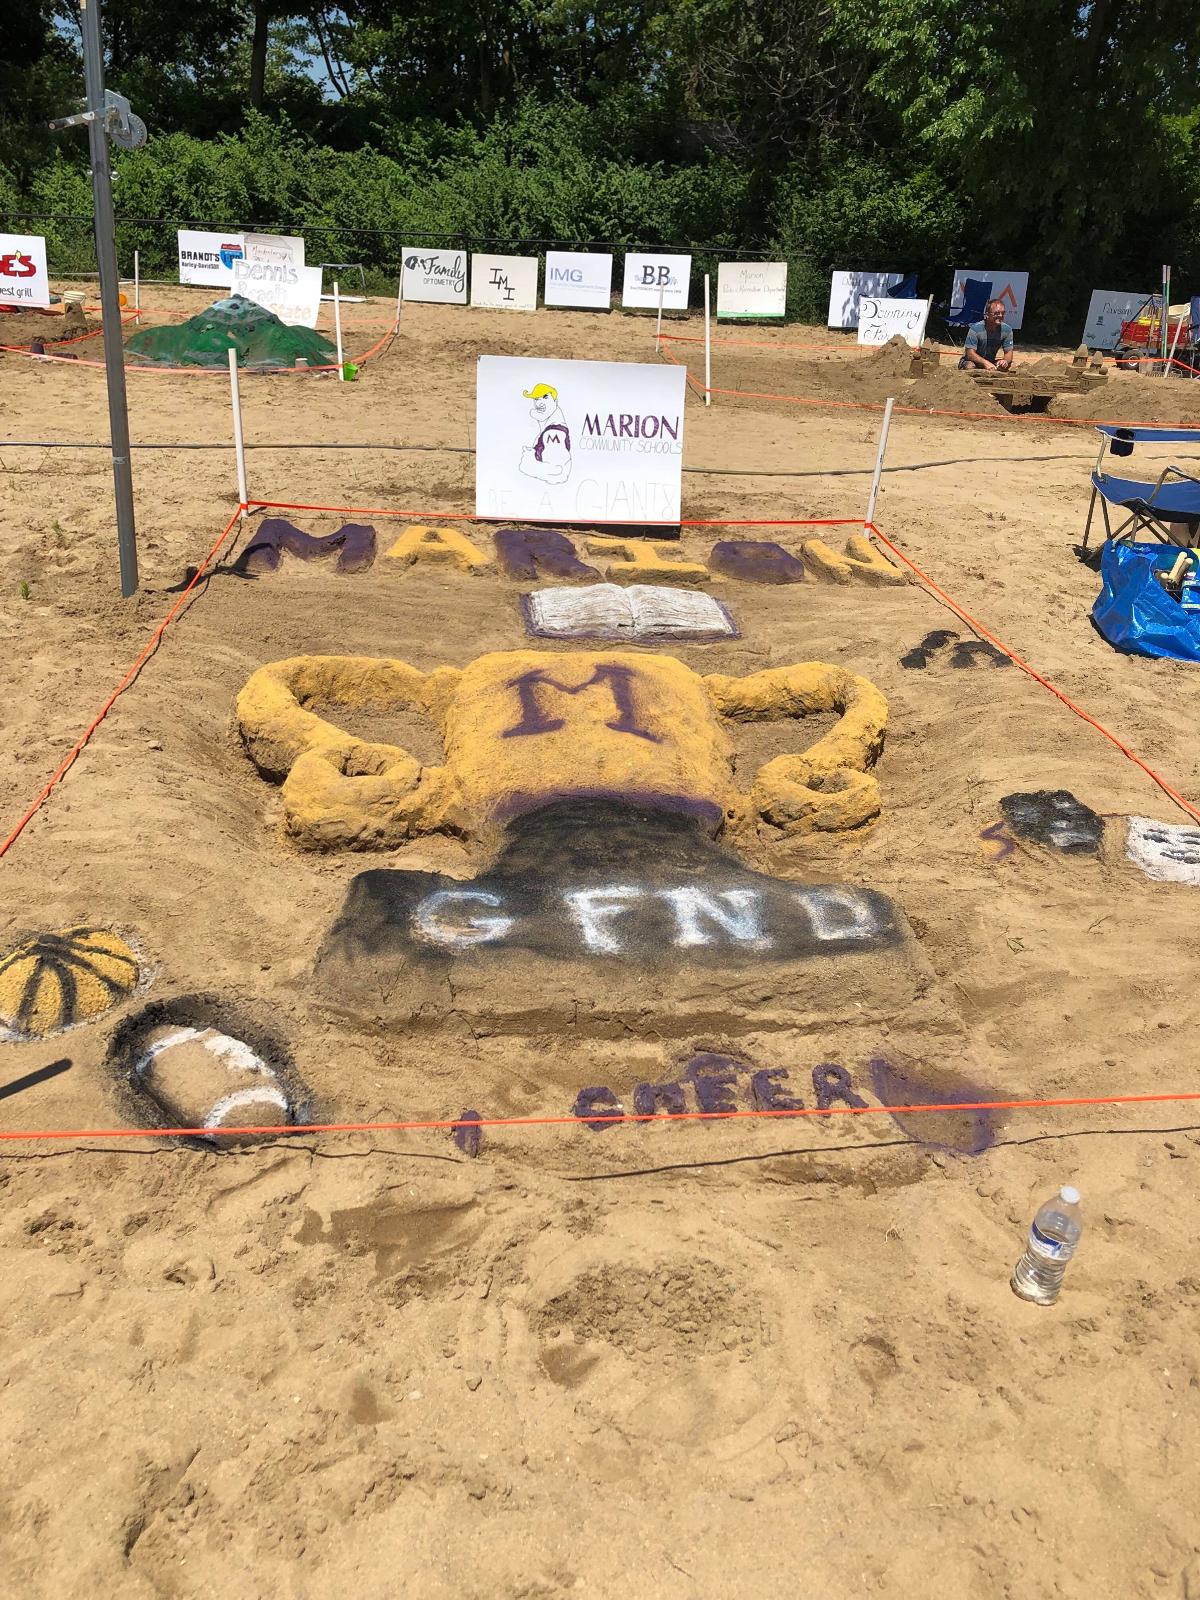 Marion Giant Cheerleaders create GFND sand sculpture